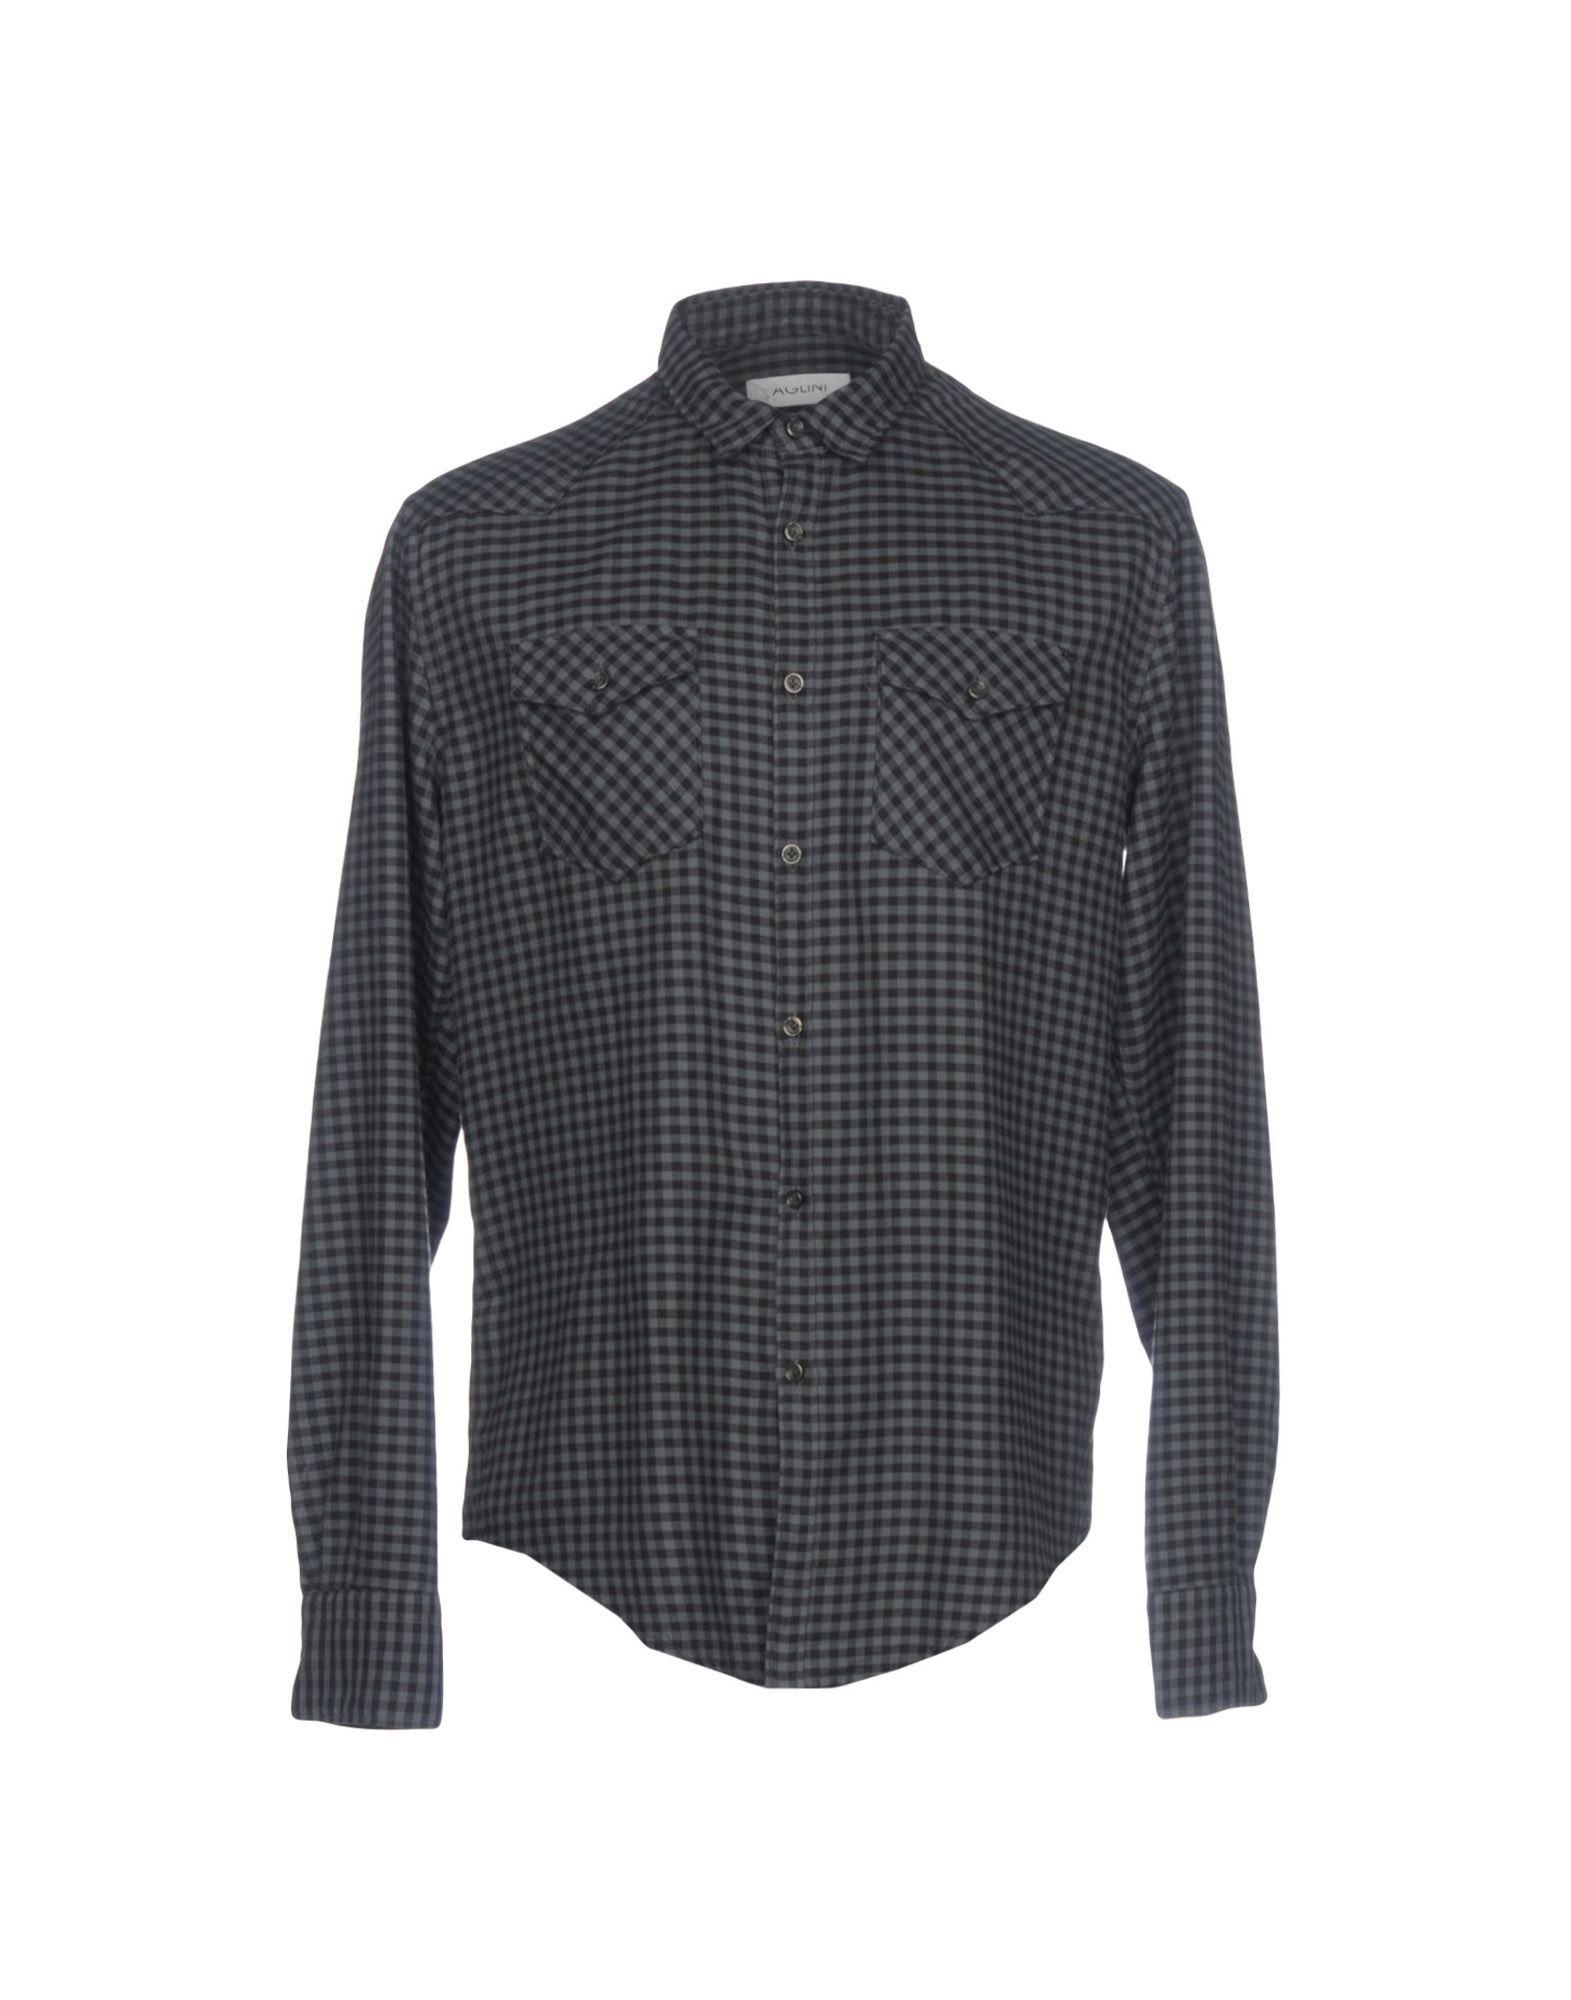 AGLINI Checked Shirt in Grey